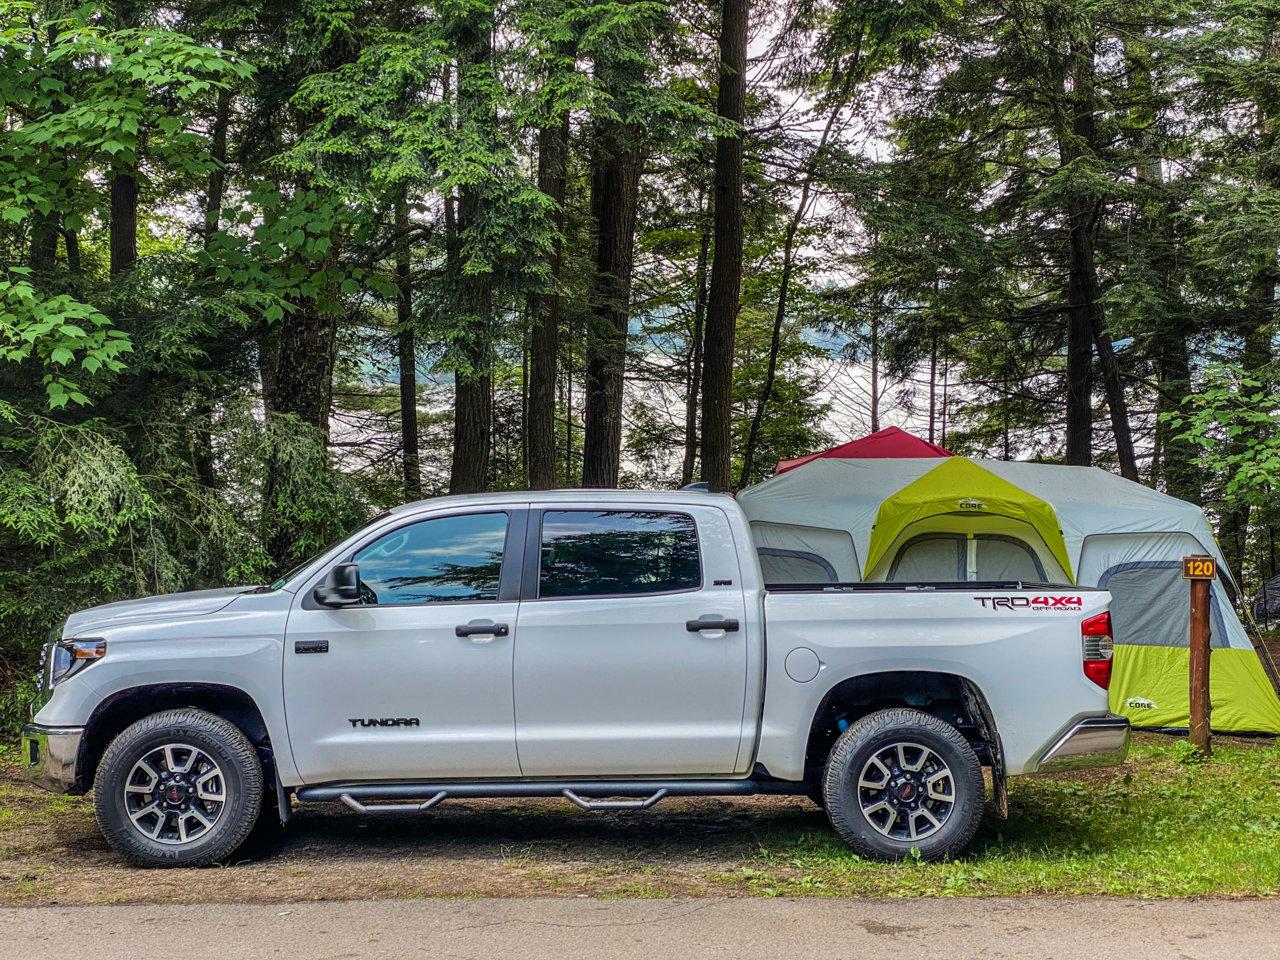 Tundra camping.jpg